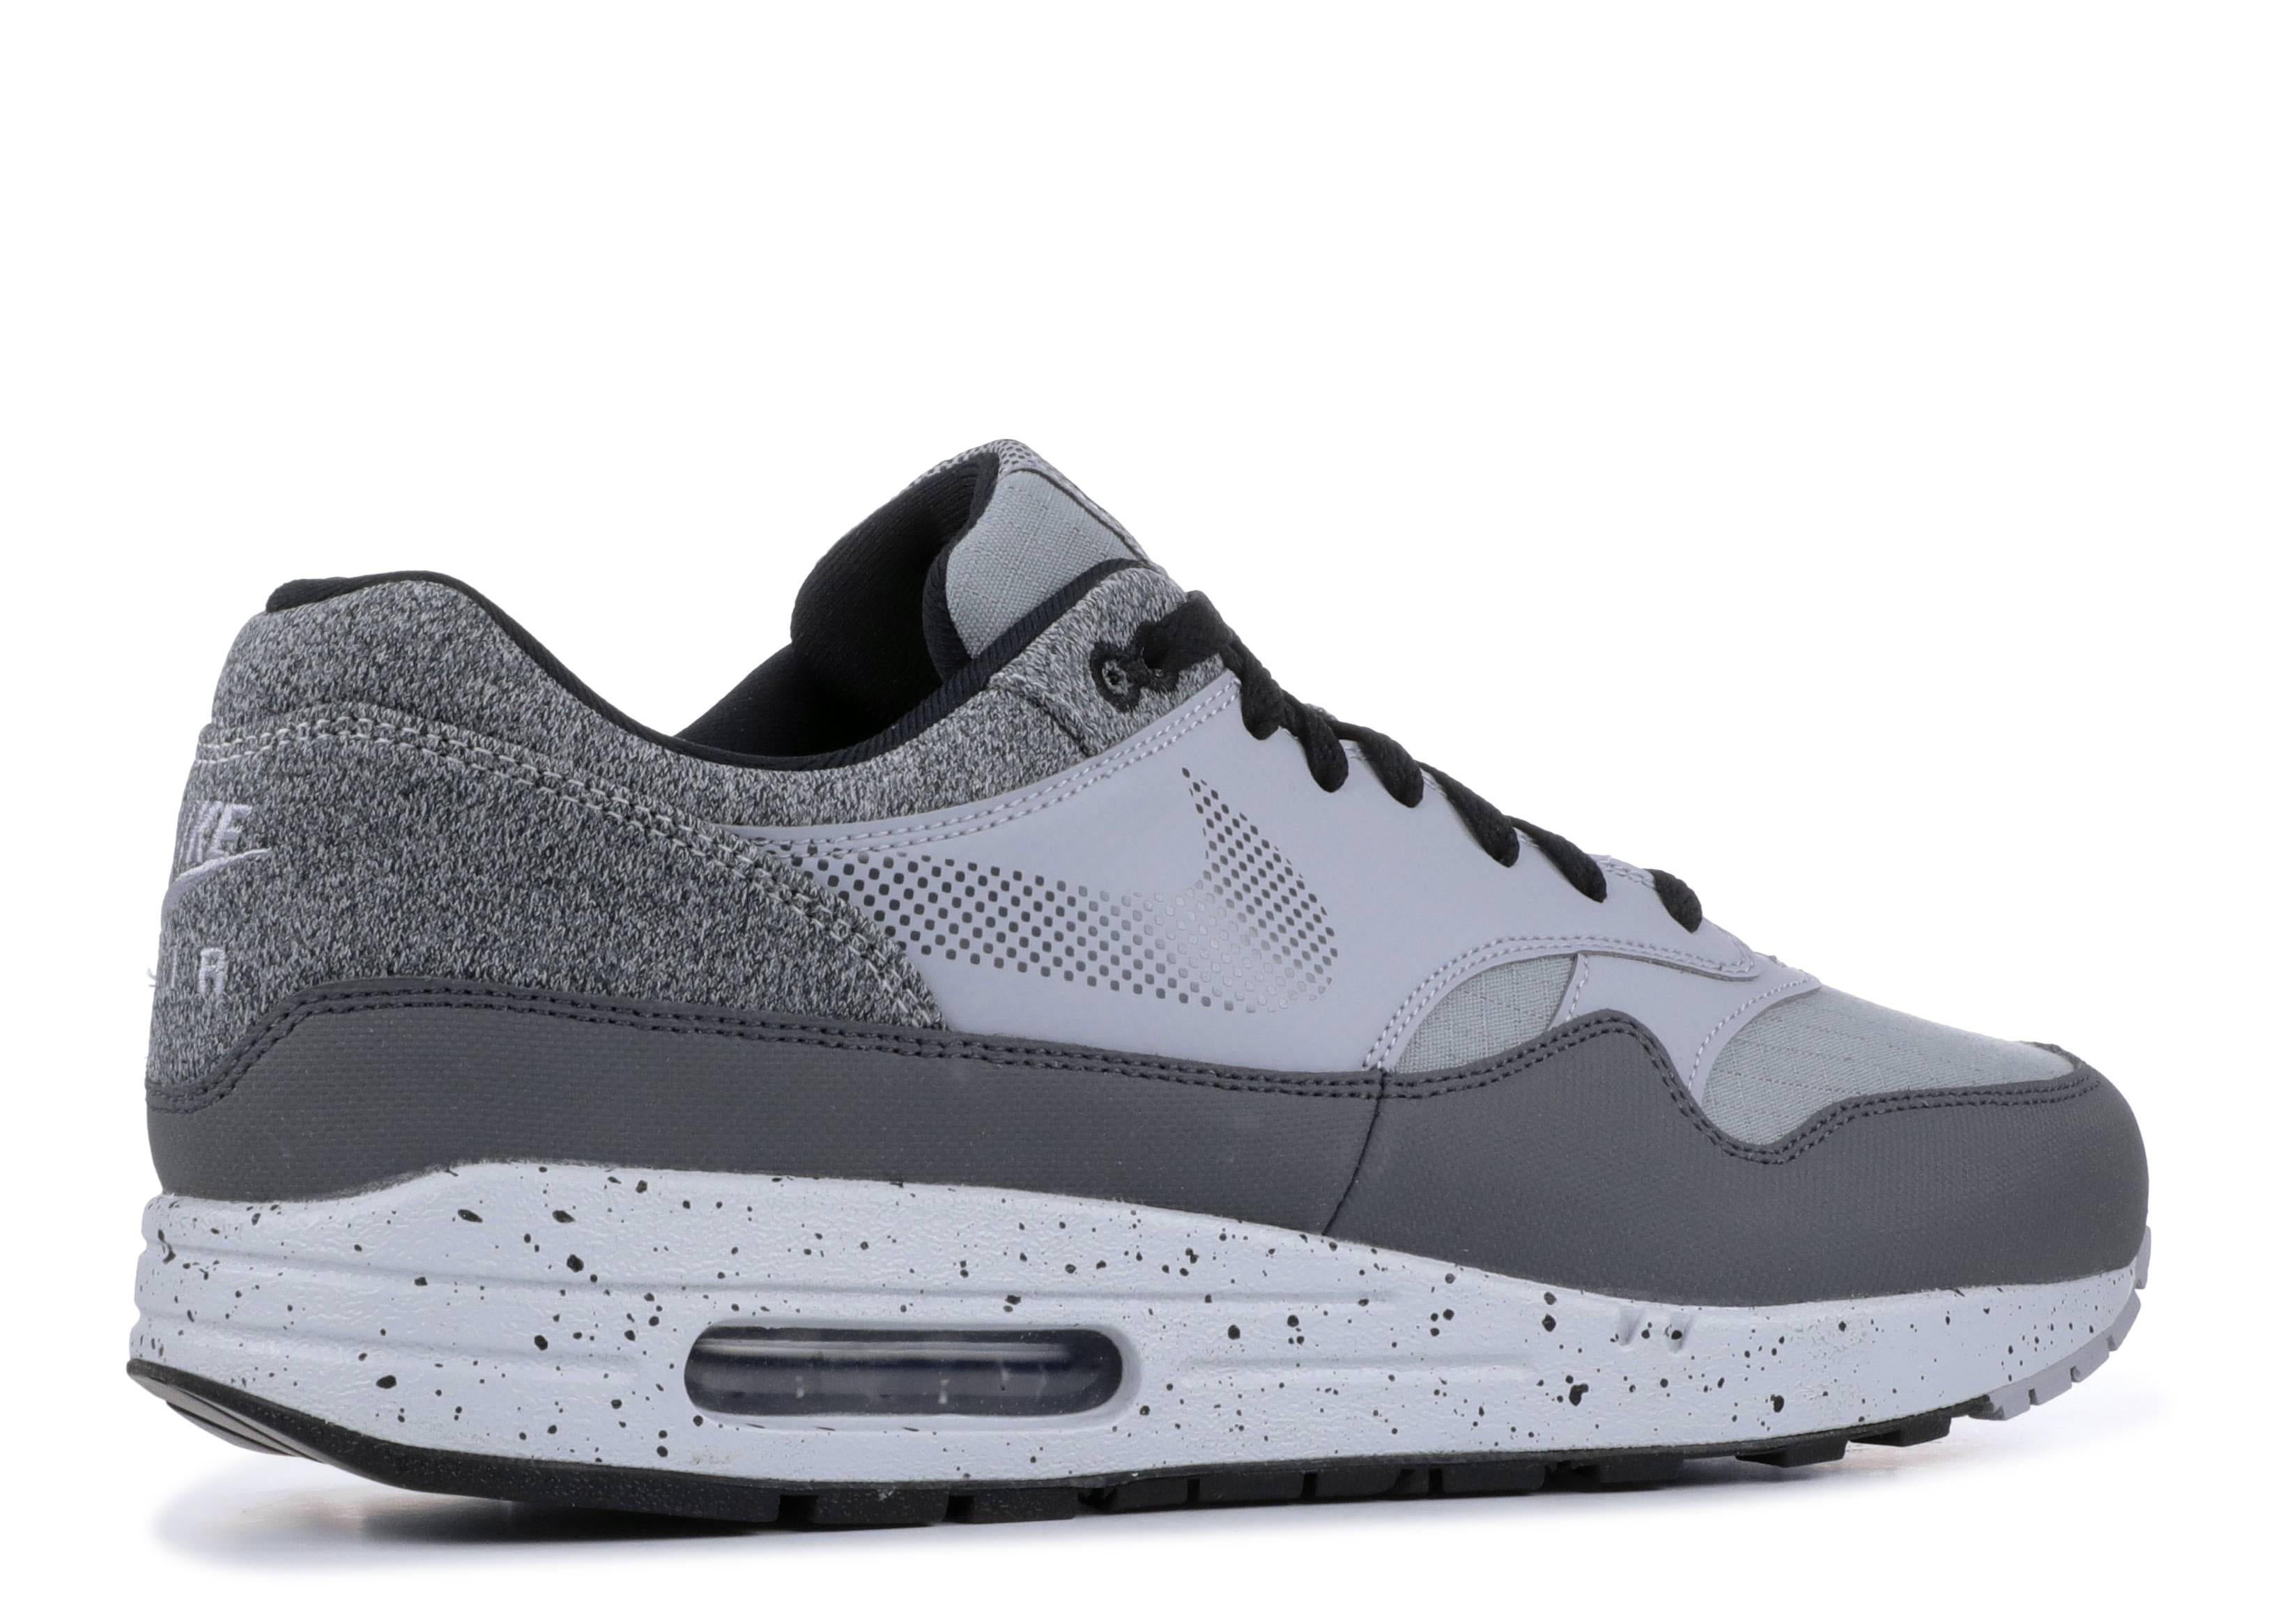 timeless design 9ba1f 7d803 Nike Air Max 1 Se - Nike - ao1021 002 - wolf grey   anthracite - dark grey    Flight Club